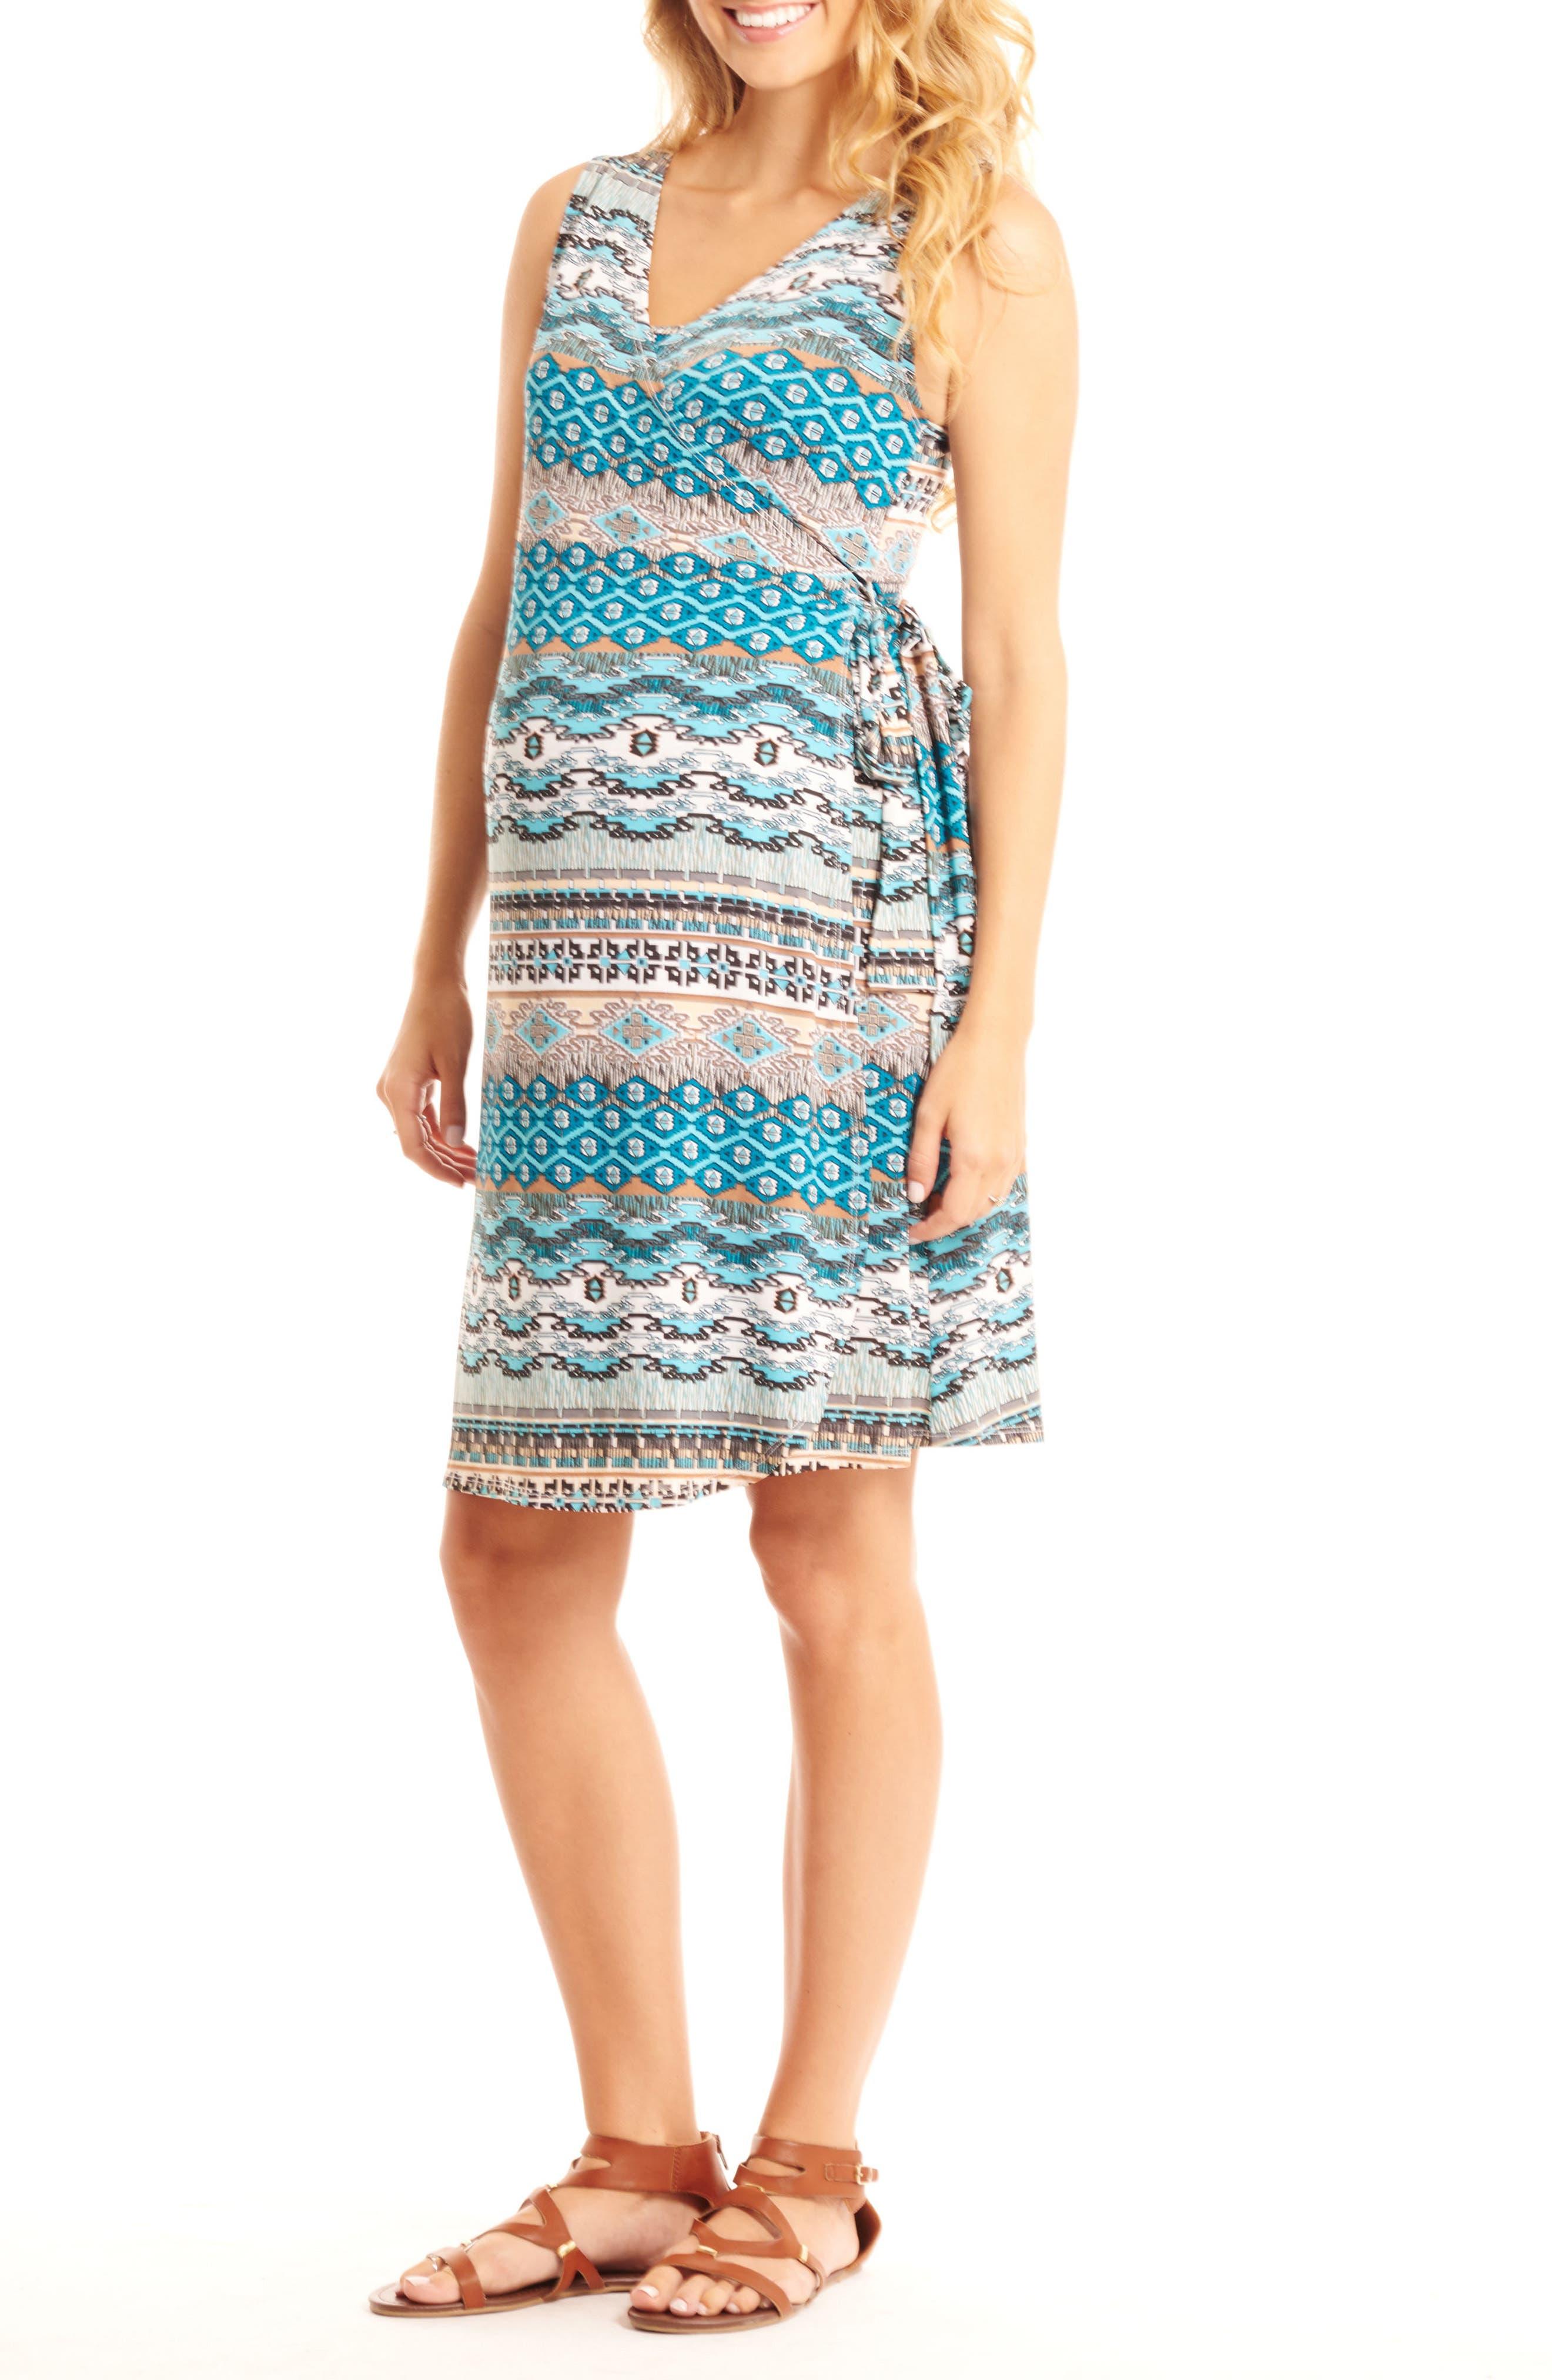 Main Image - Everly Grey 'Tania' Sleeveless Maternity/Nursing Wrap Dress